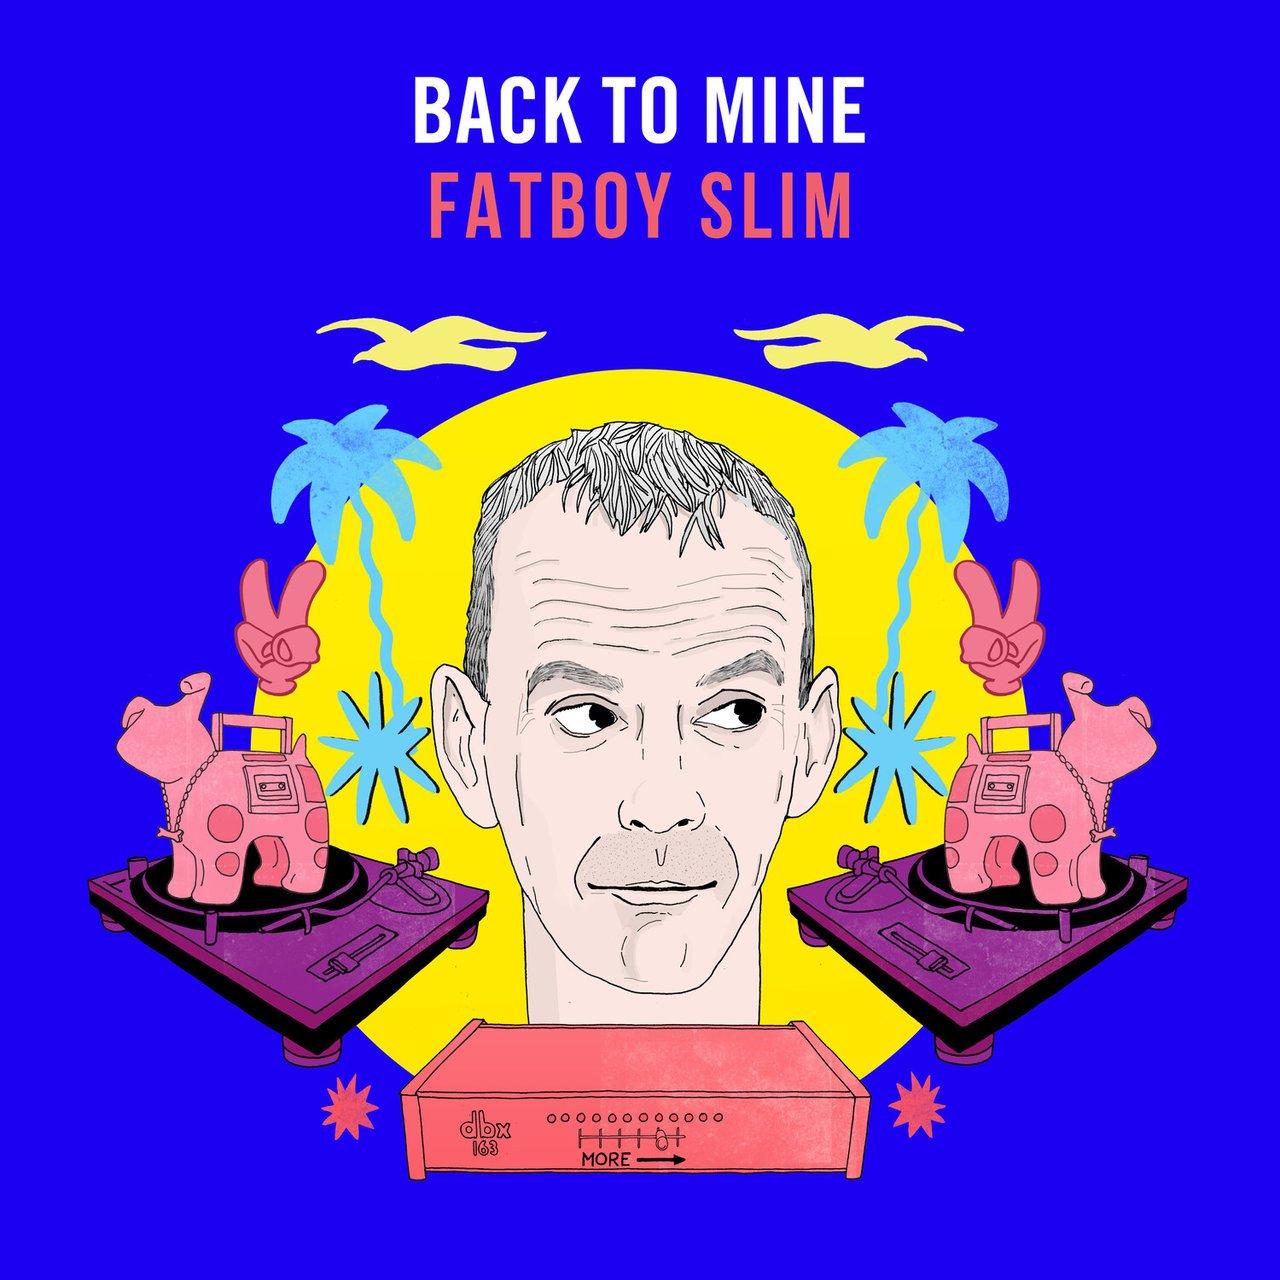 Fatboy Slim - Back To Mine (2020) 2CD Promo